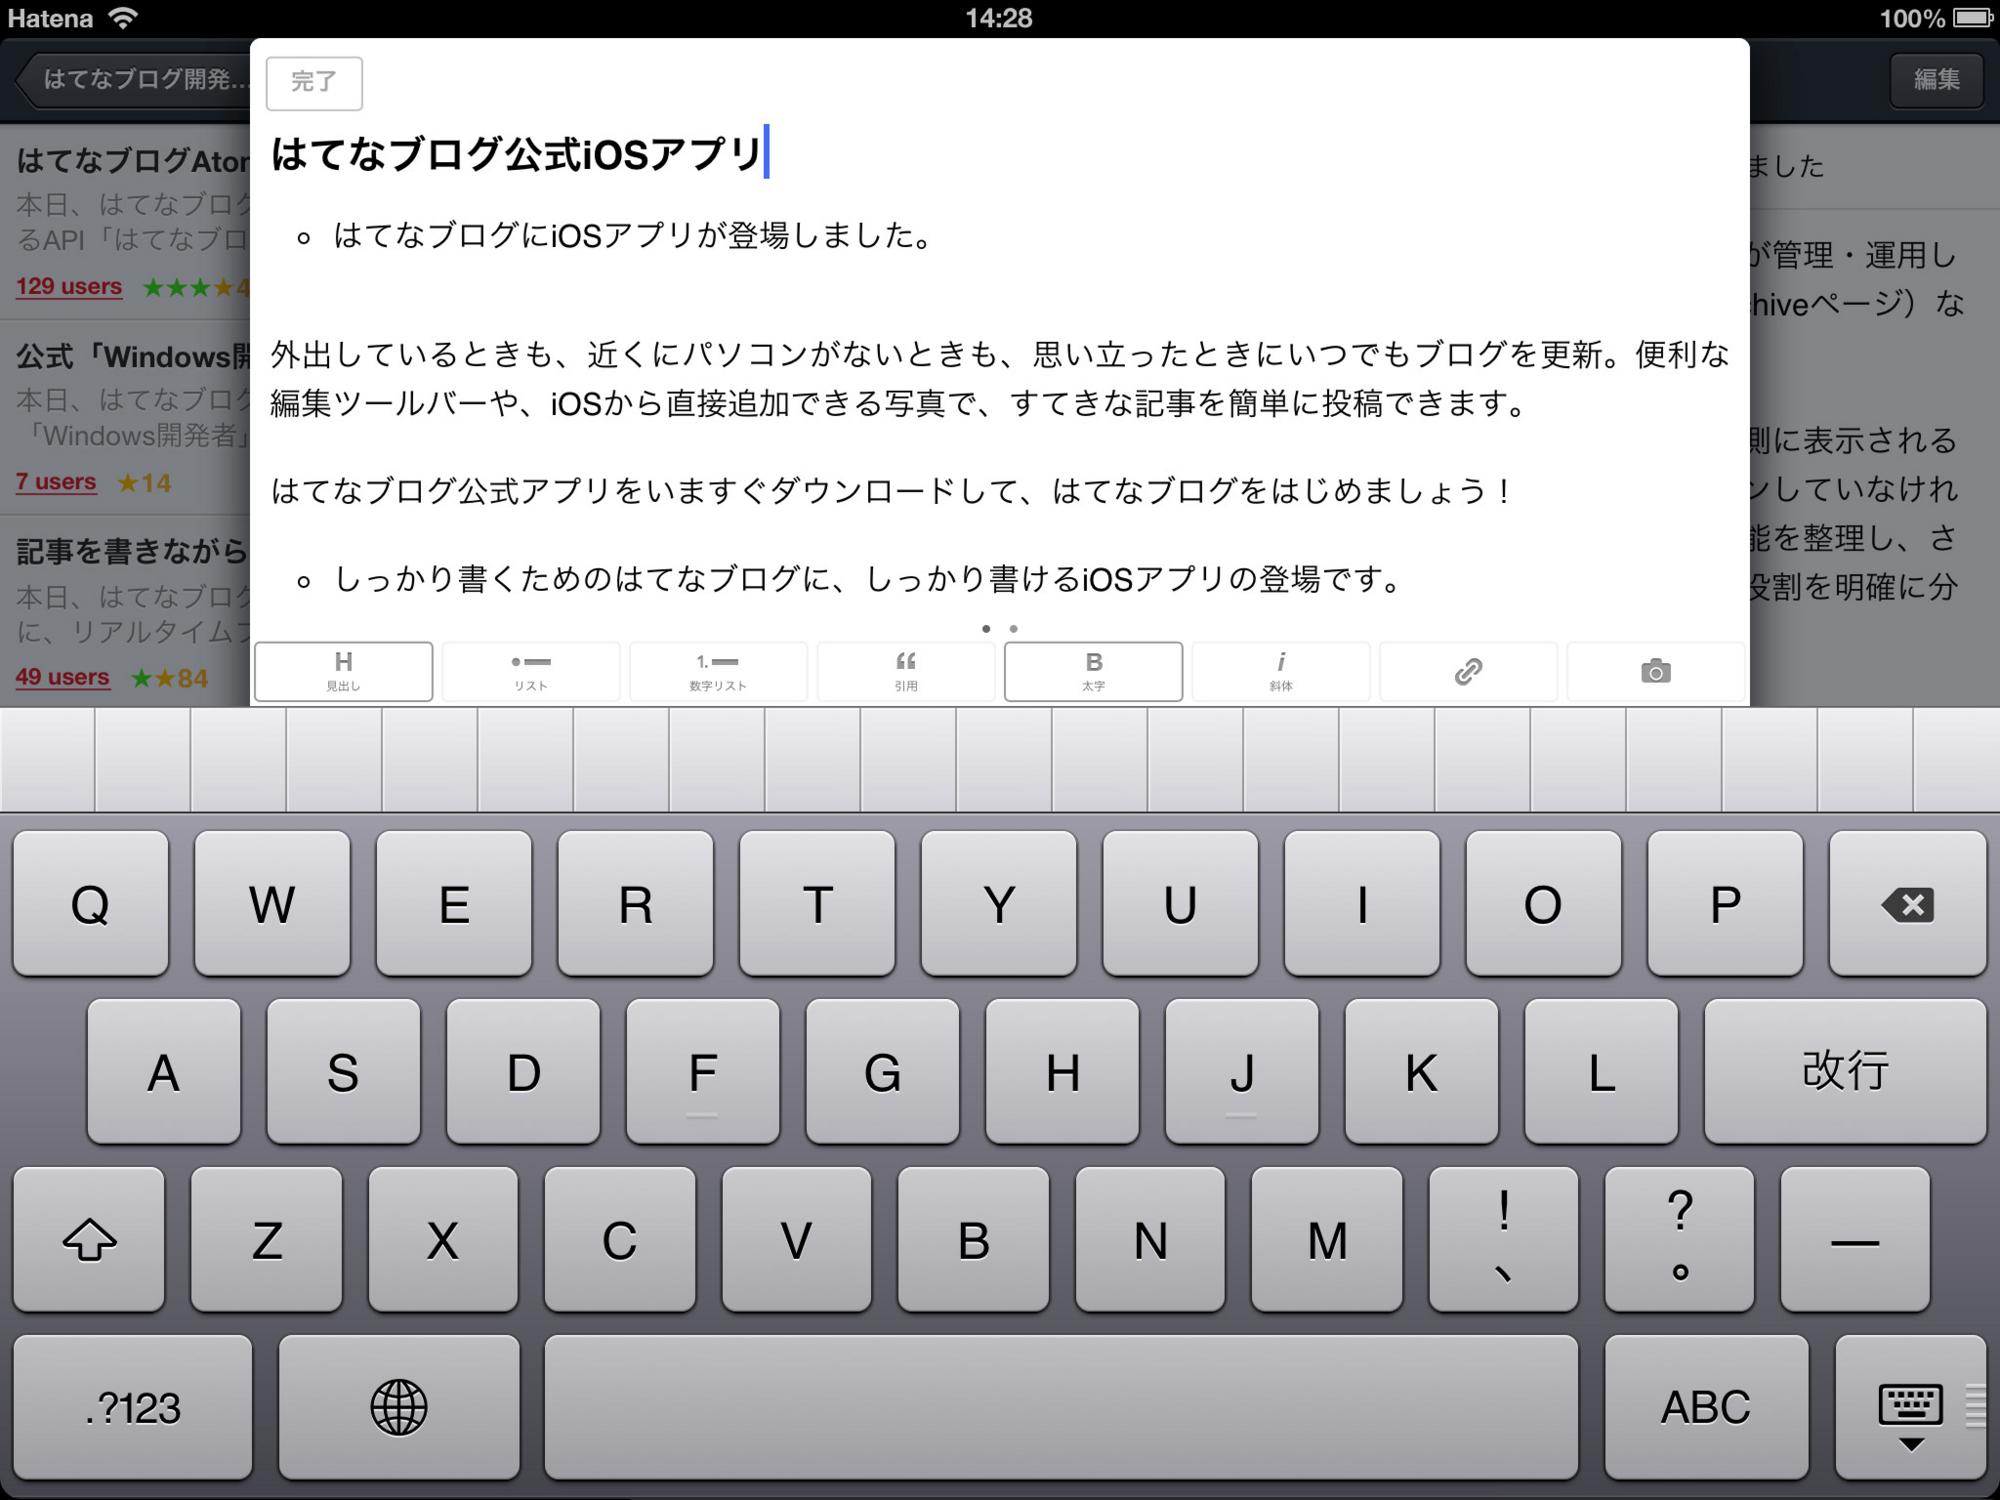 iOSアプリ「はてなブログ」の編集画面